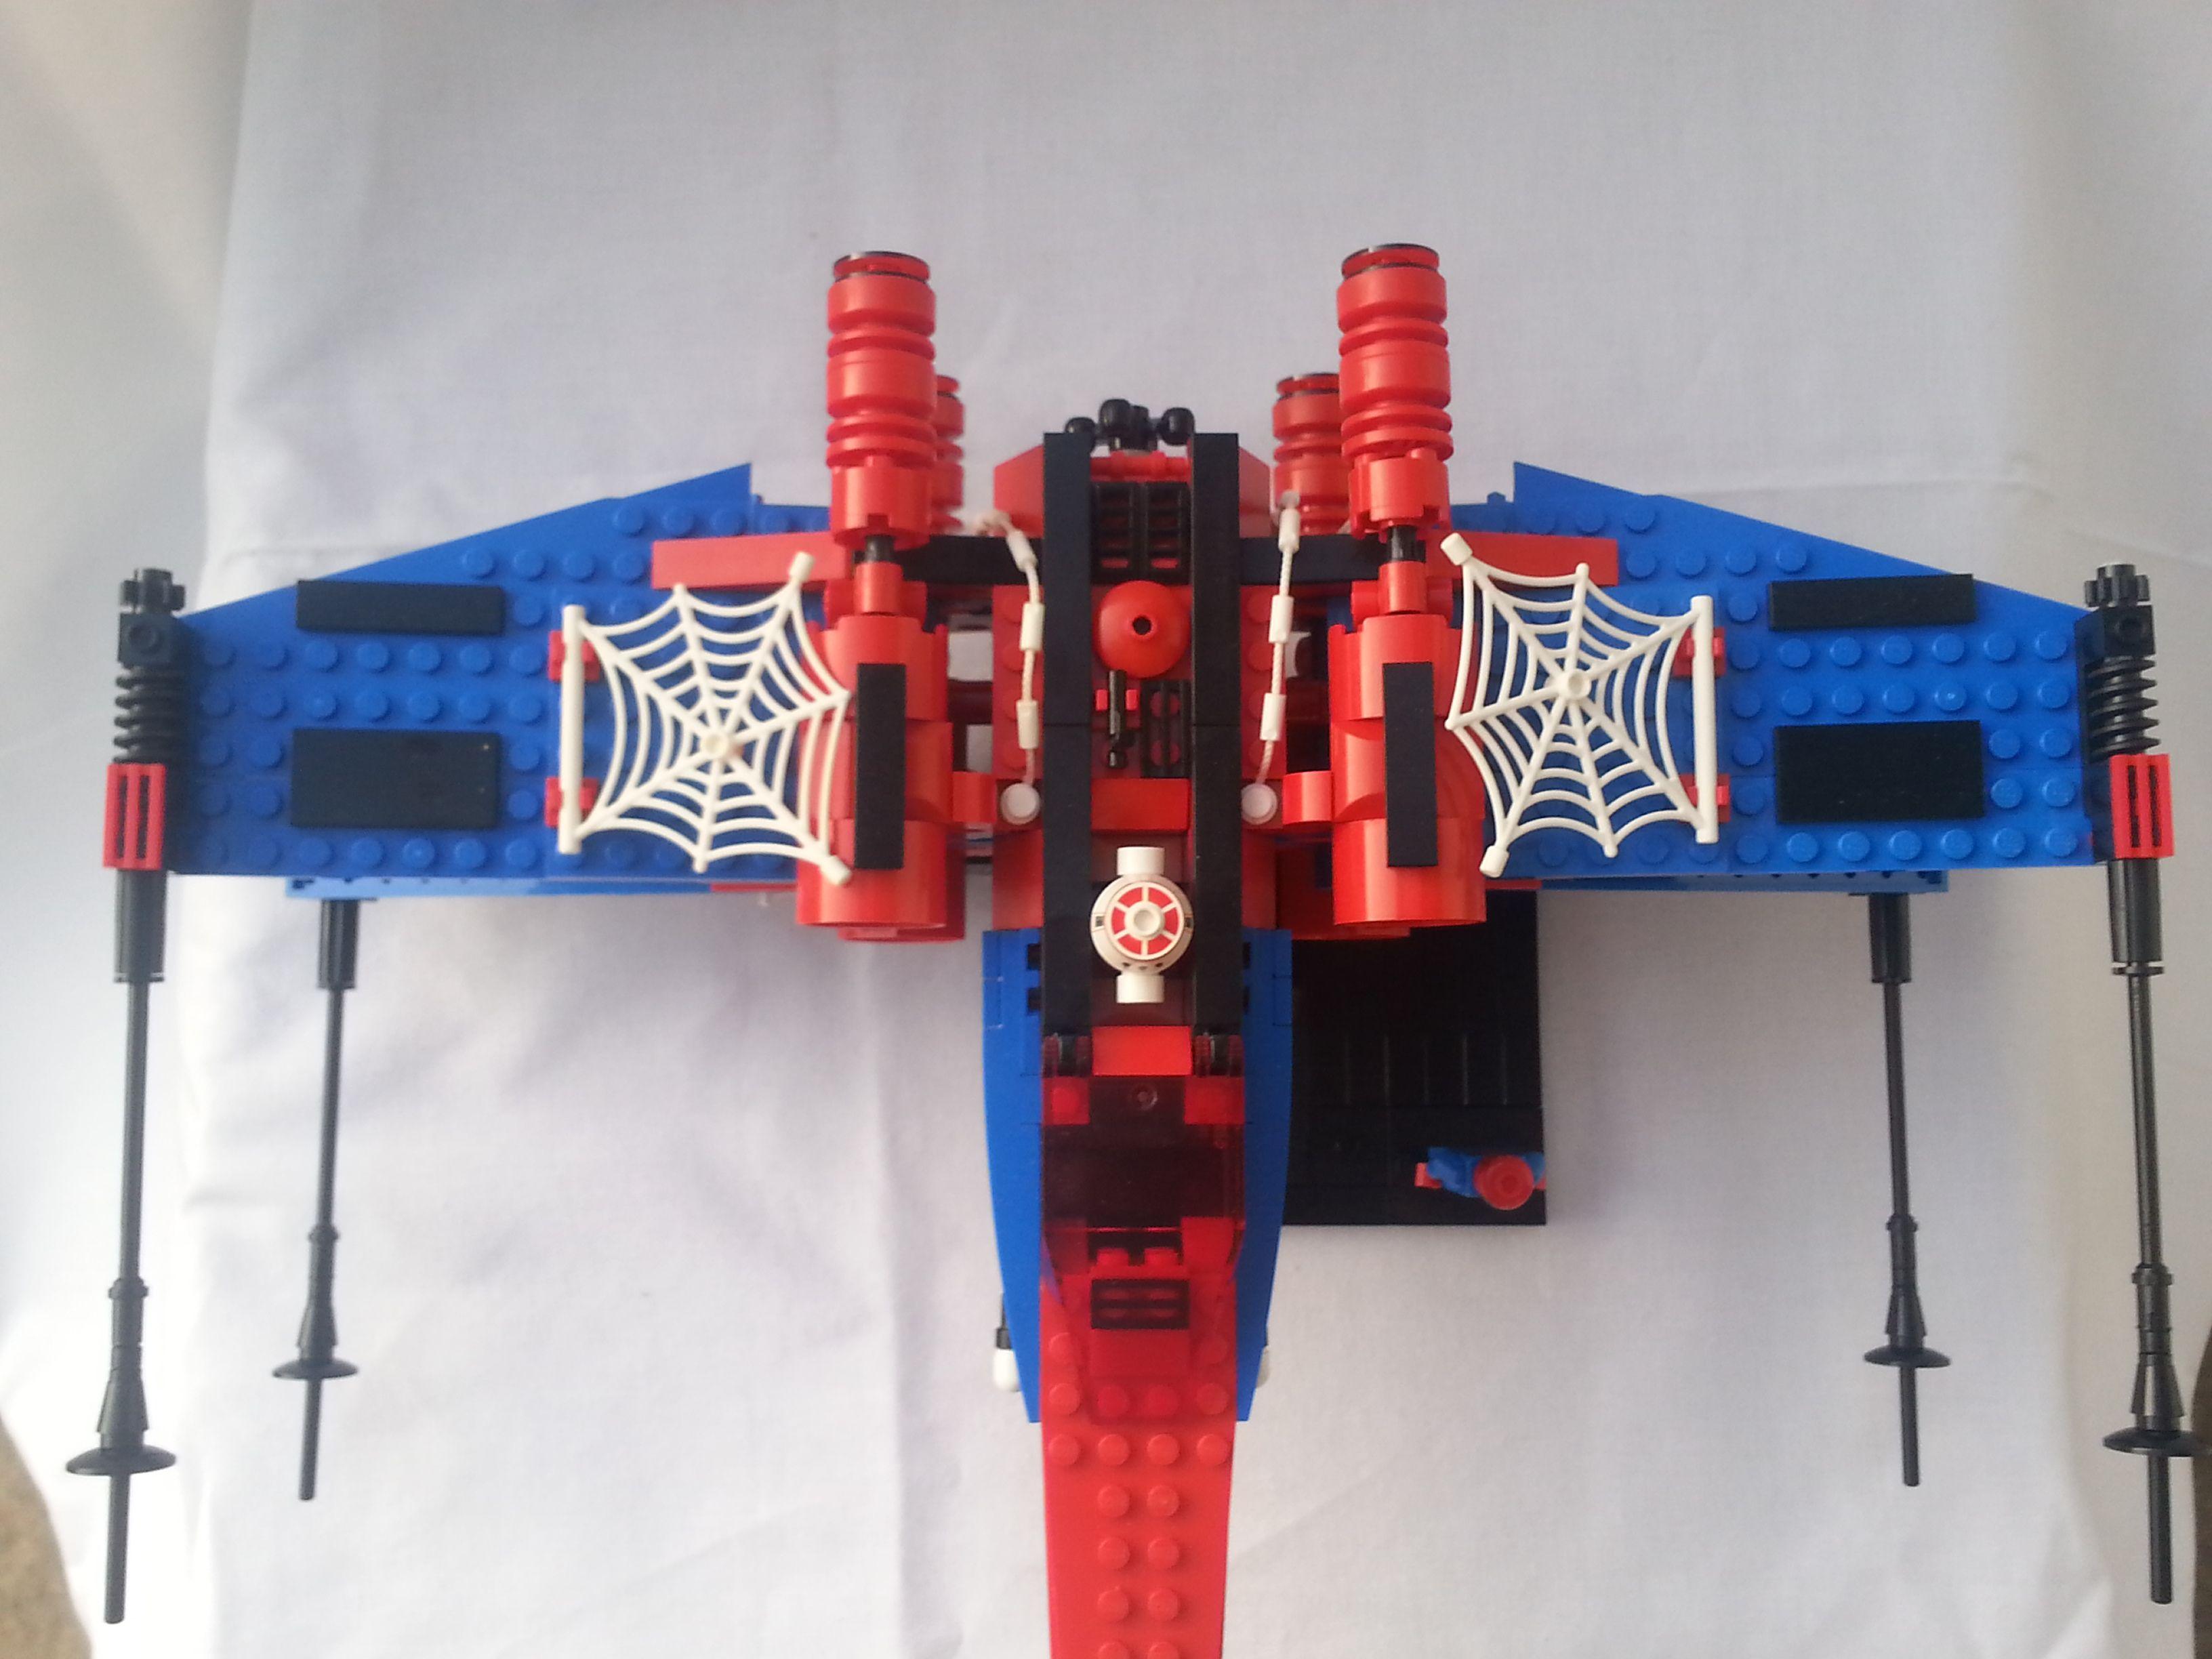 Lego Spiderman Malvorlagen Star Wars 1 Lego Spiderman: LEGO Spider-man X-Wing MOC